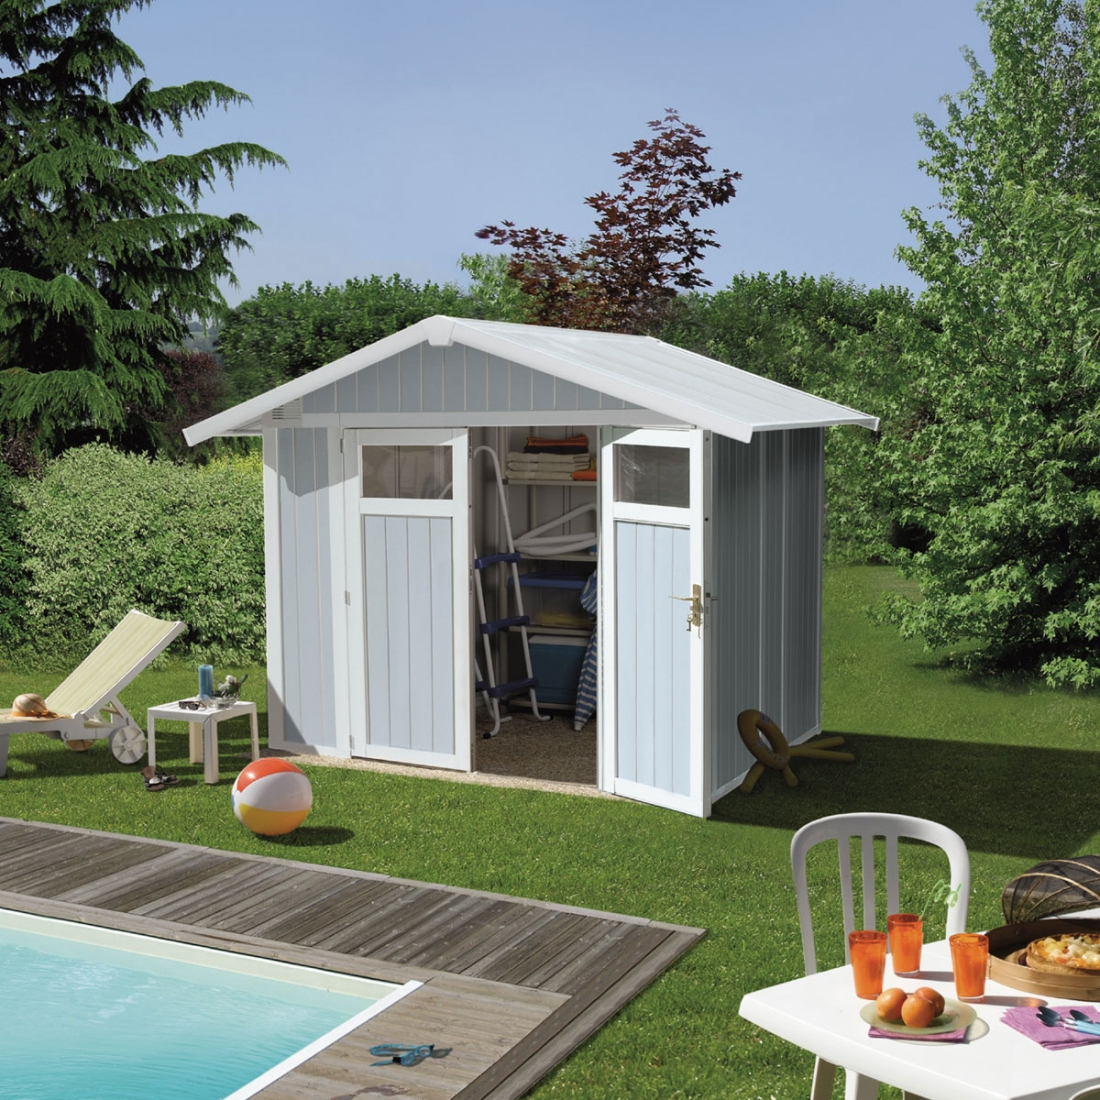 Abri Jardin Grosfillex Utility 4,9 - Zendart Design destiné Abri De Jardin Grosfillex